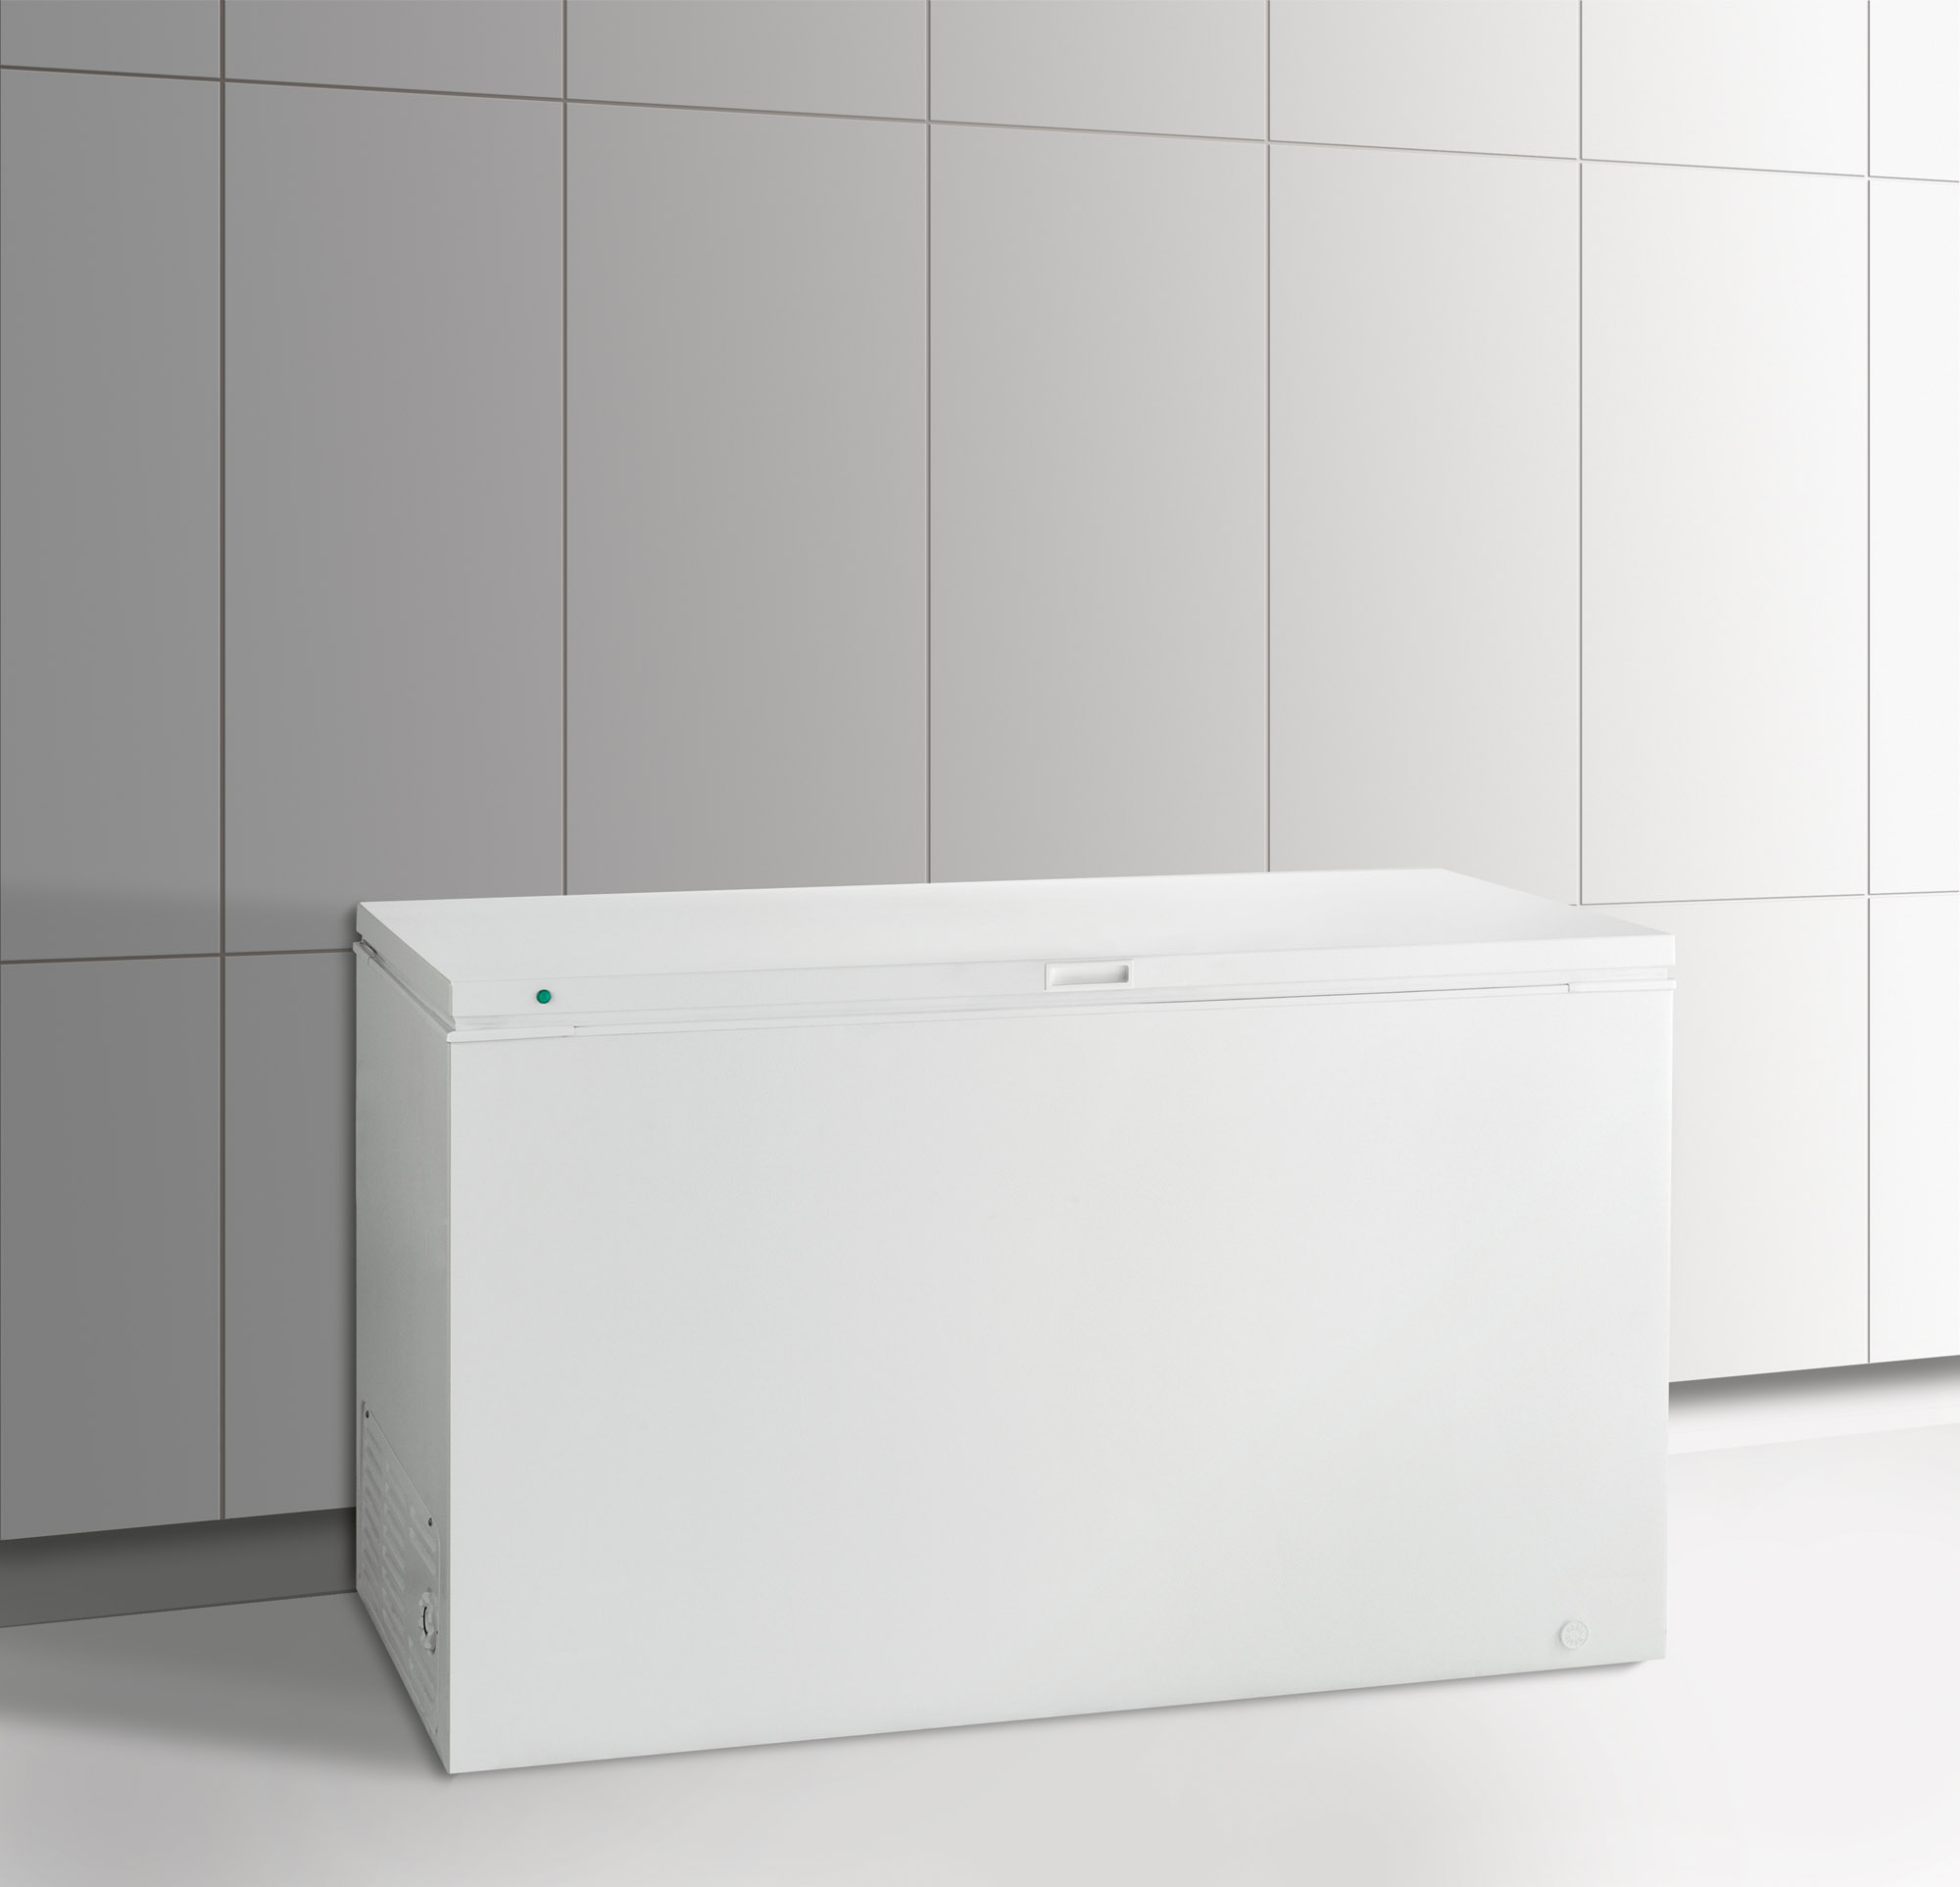 Frigidaire FFFC09M1QW 9.0 cu. ft. Chest Freezer - White